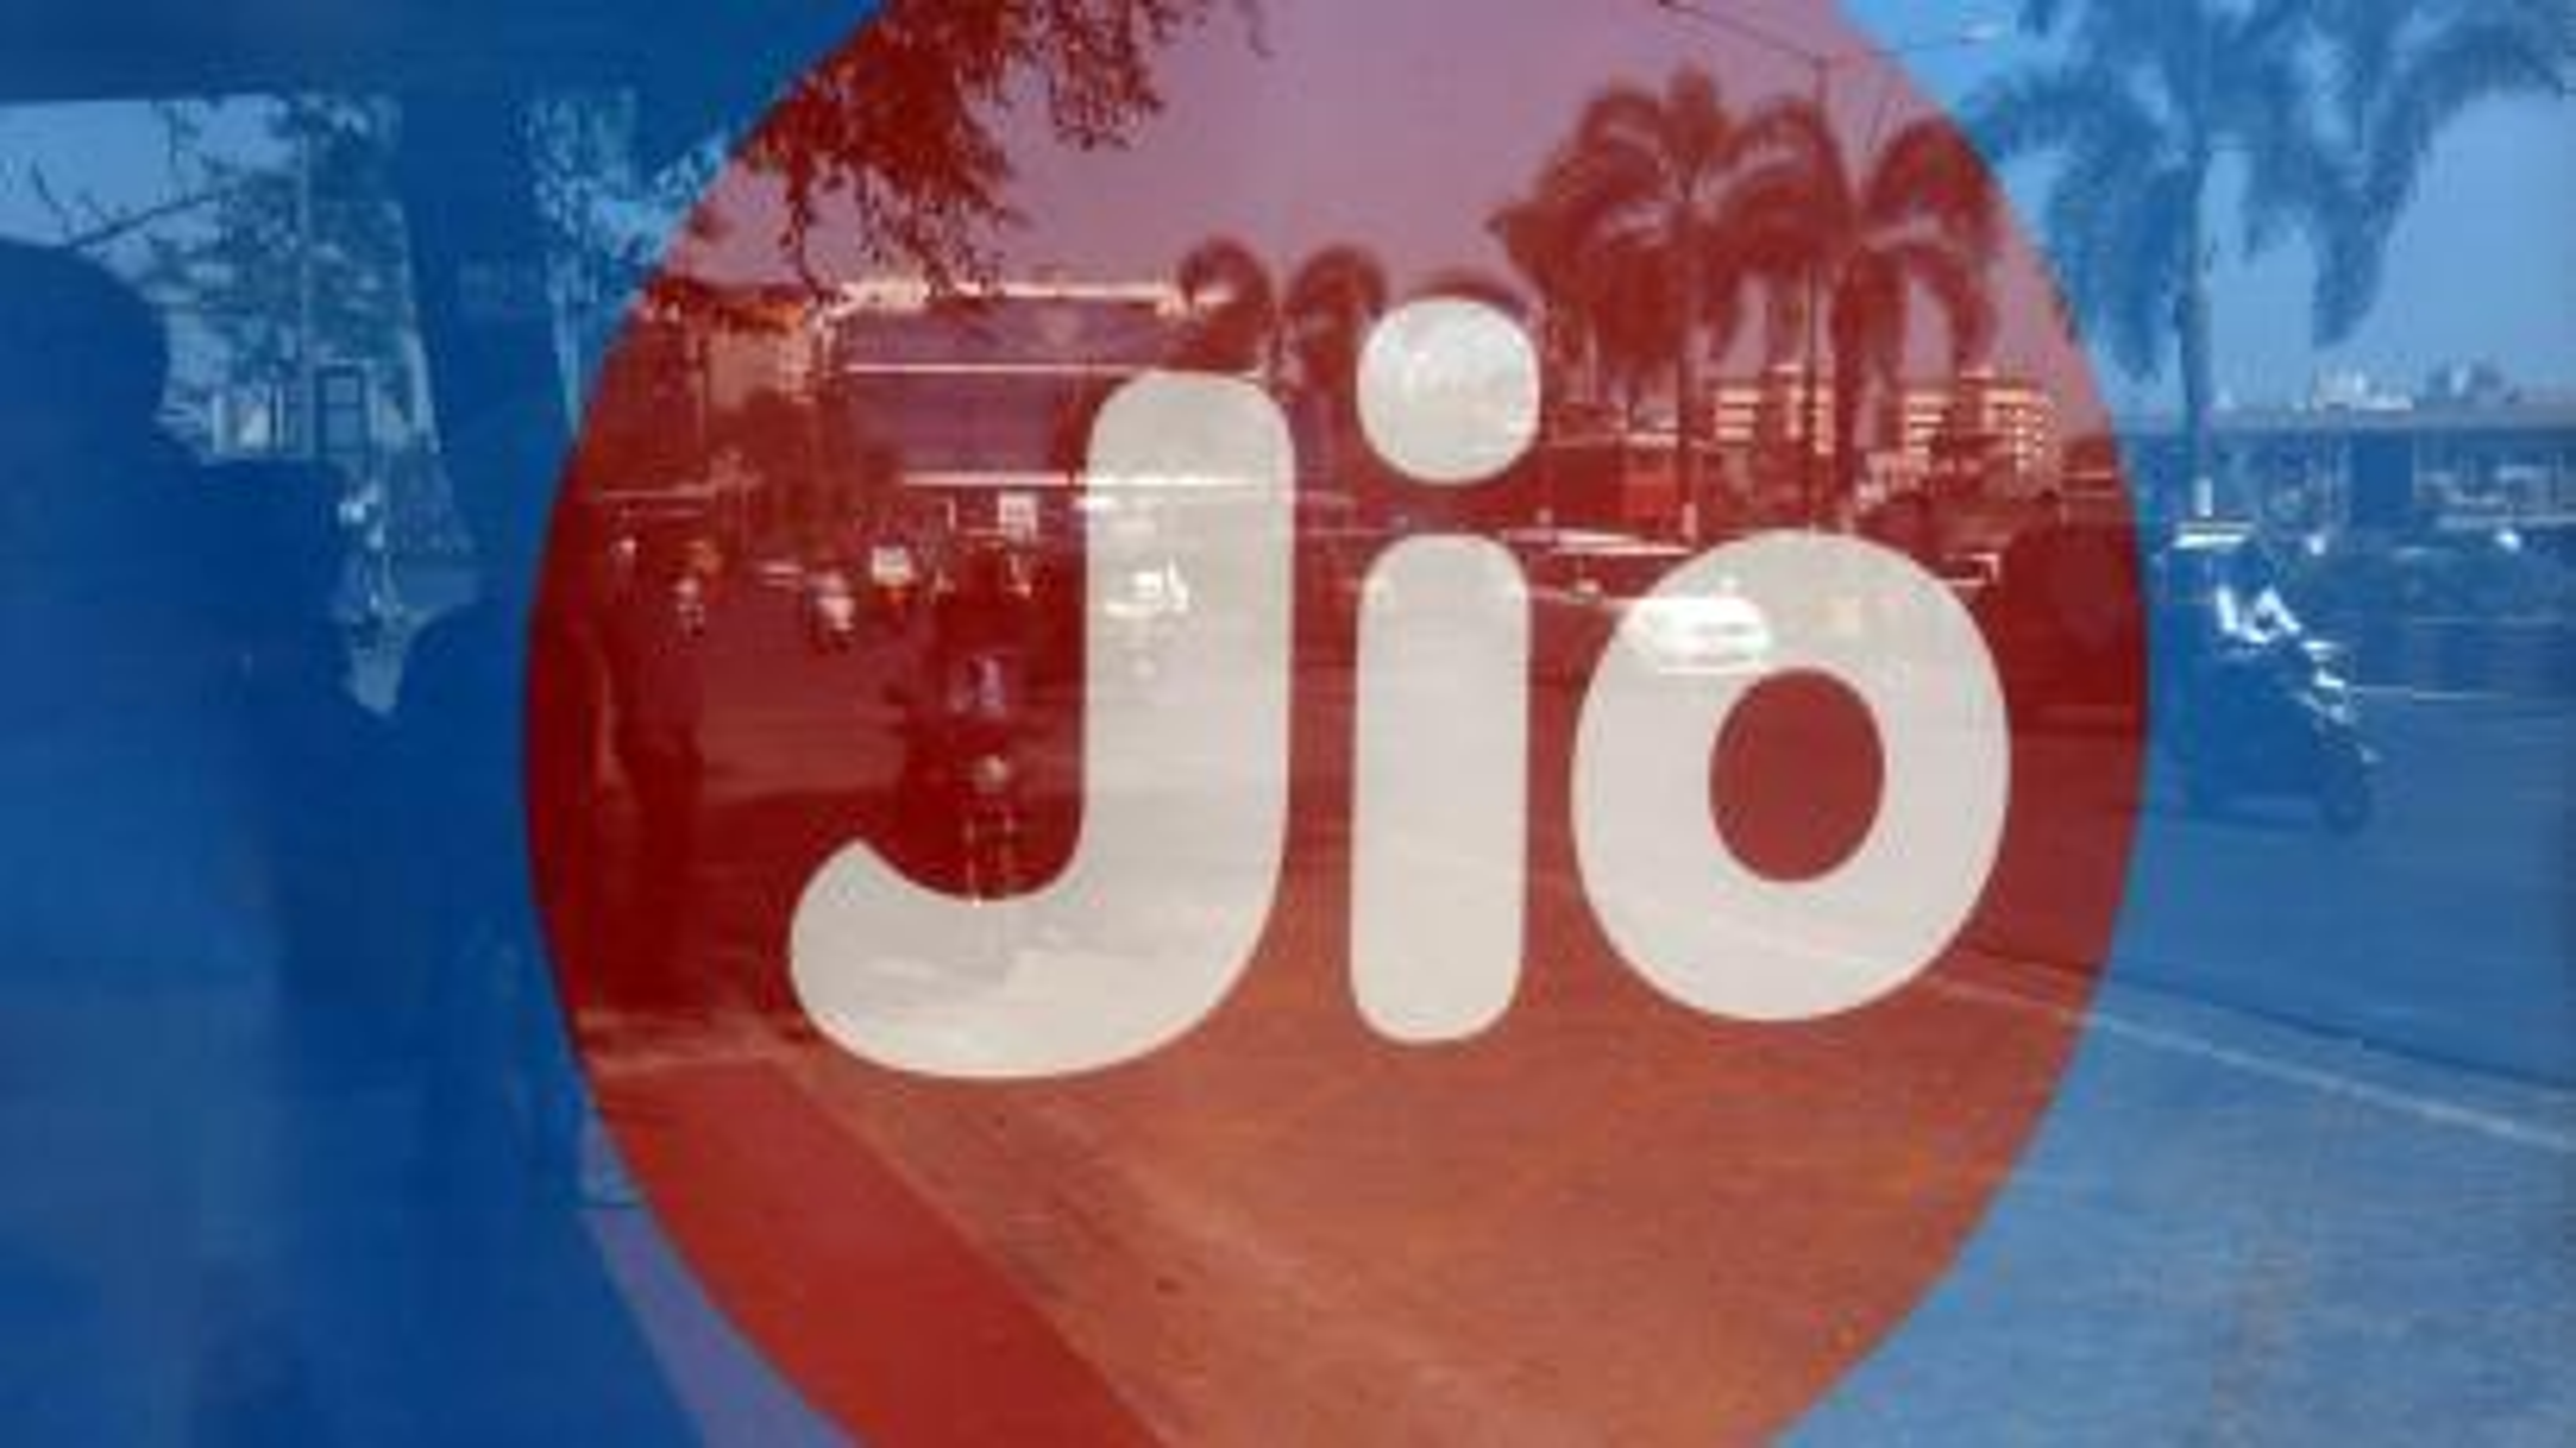 Mukesh Ambani's RIL offers free LED TV with Jio Fiber